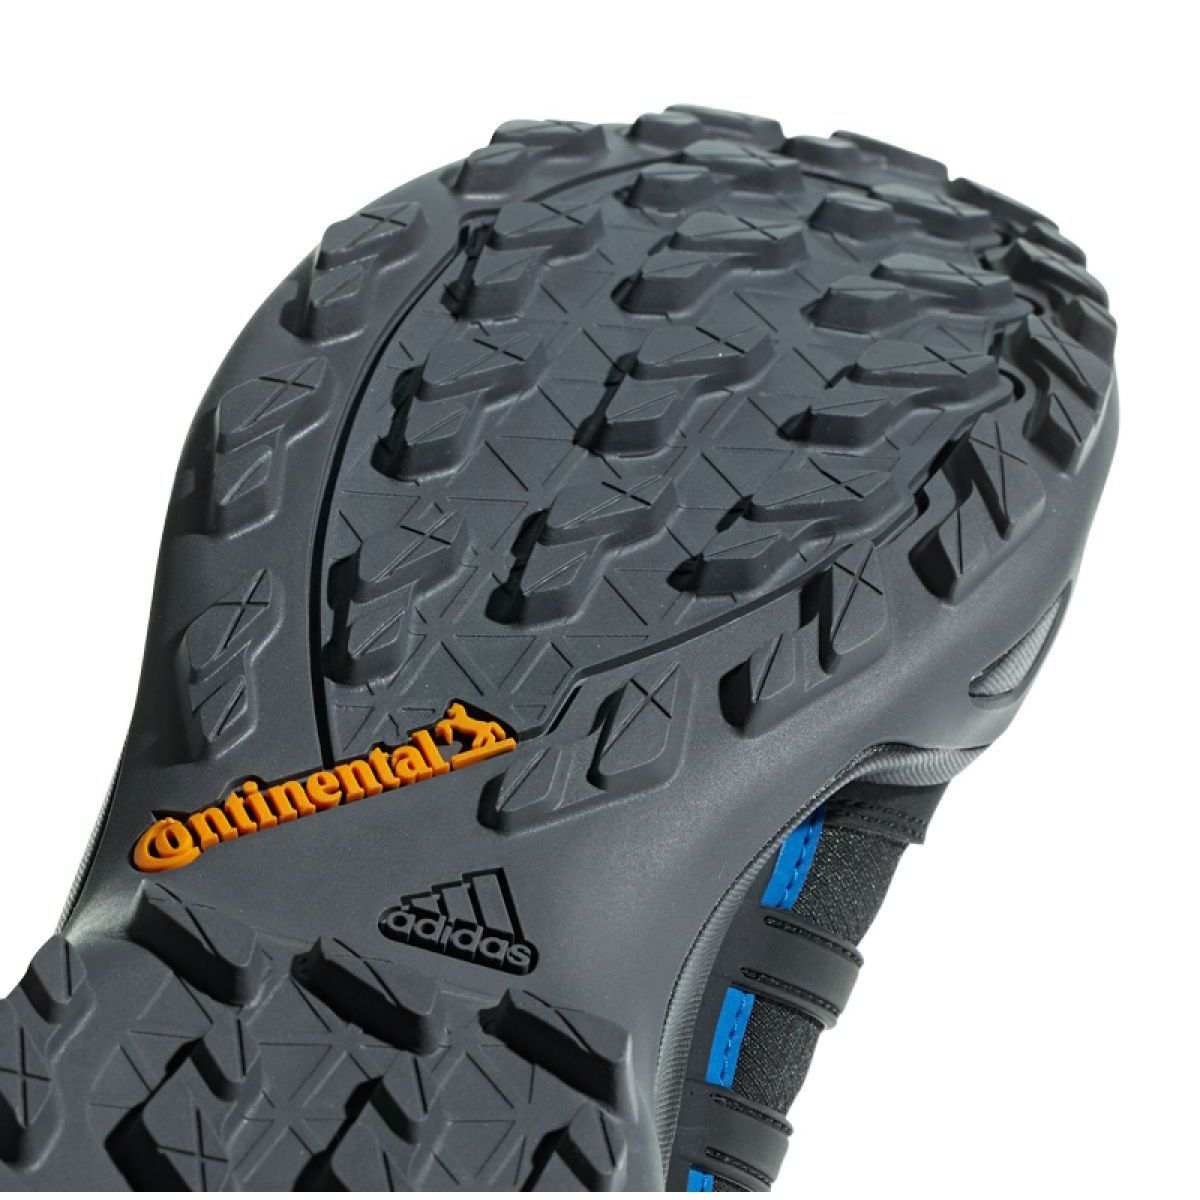 Buty Adidas Terrex Swift R2 Mid Gtx M Ac7771 Czarne Sports Shoes Adidas Trekking Shoes Black Shoes